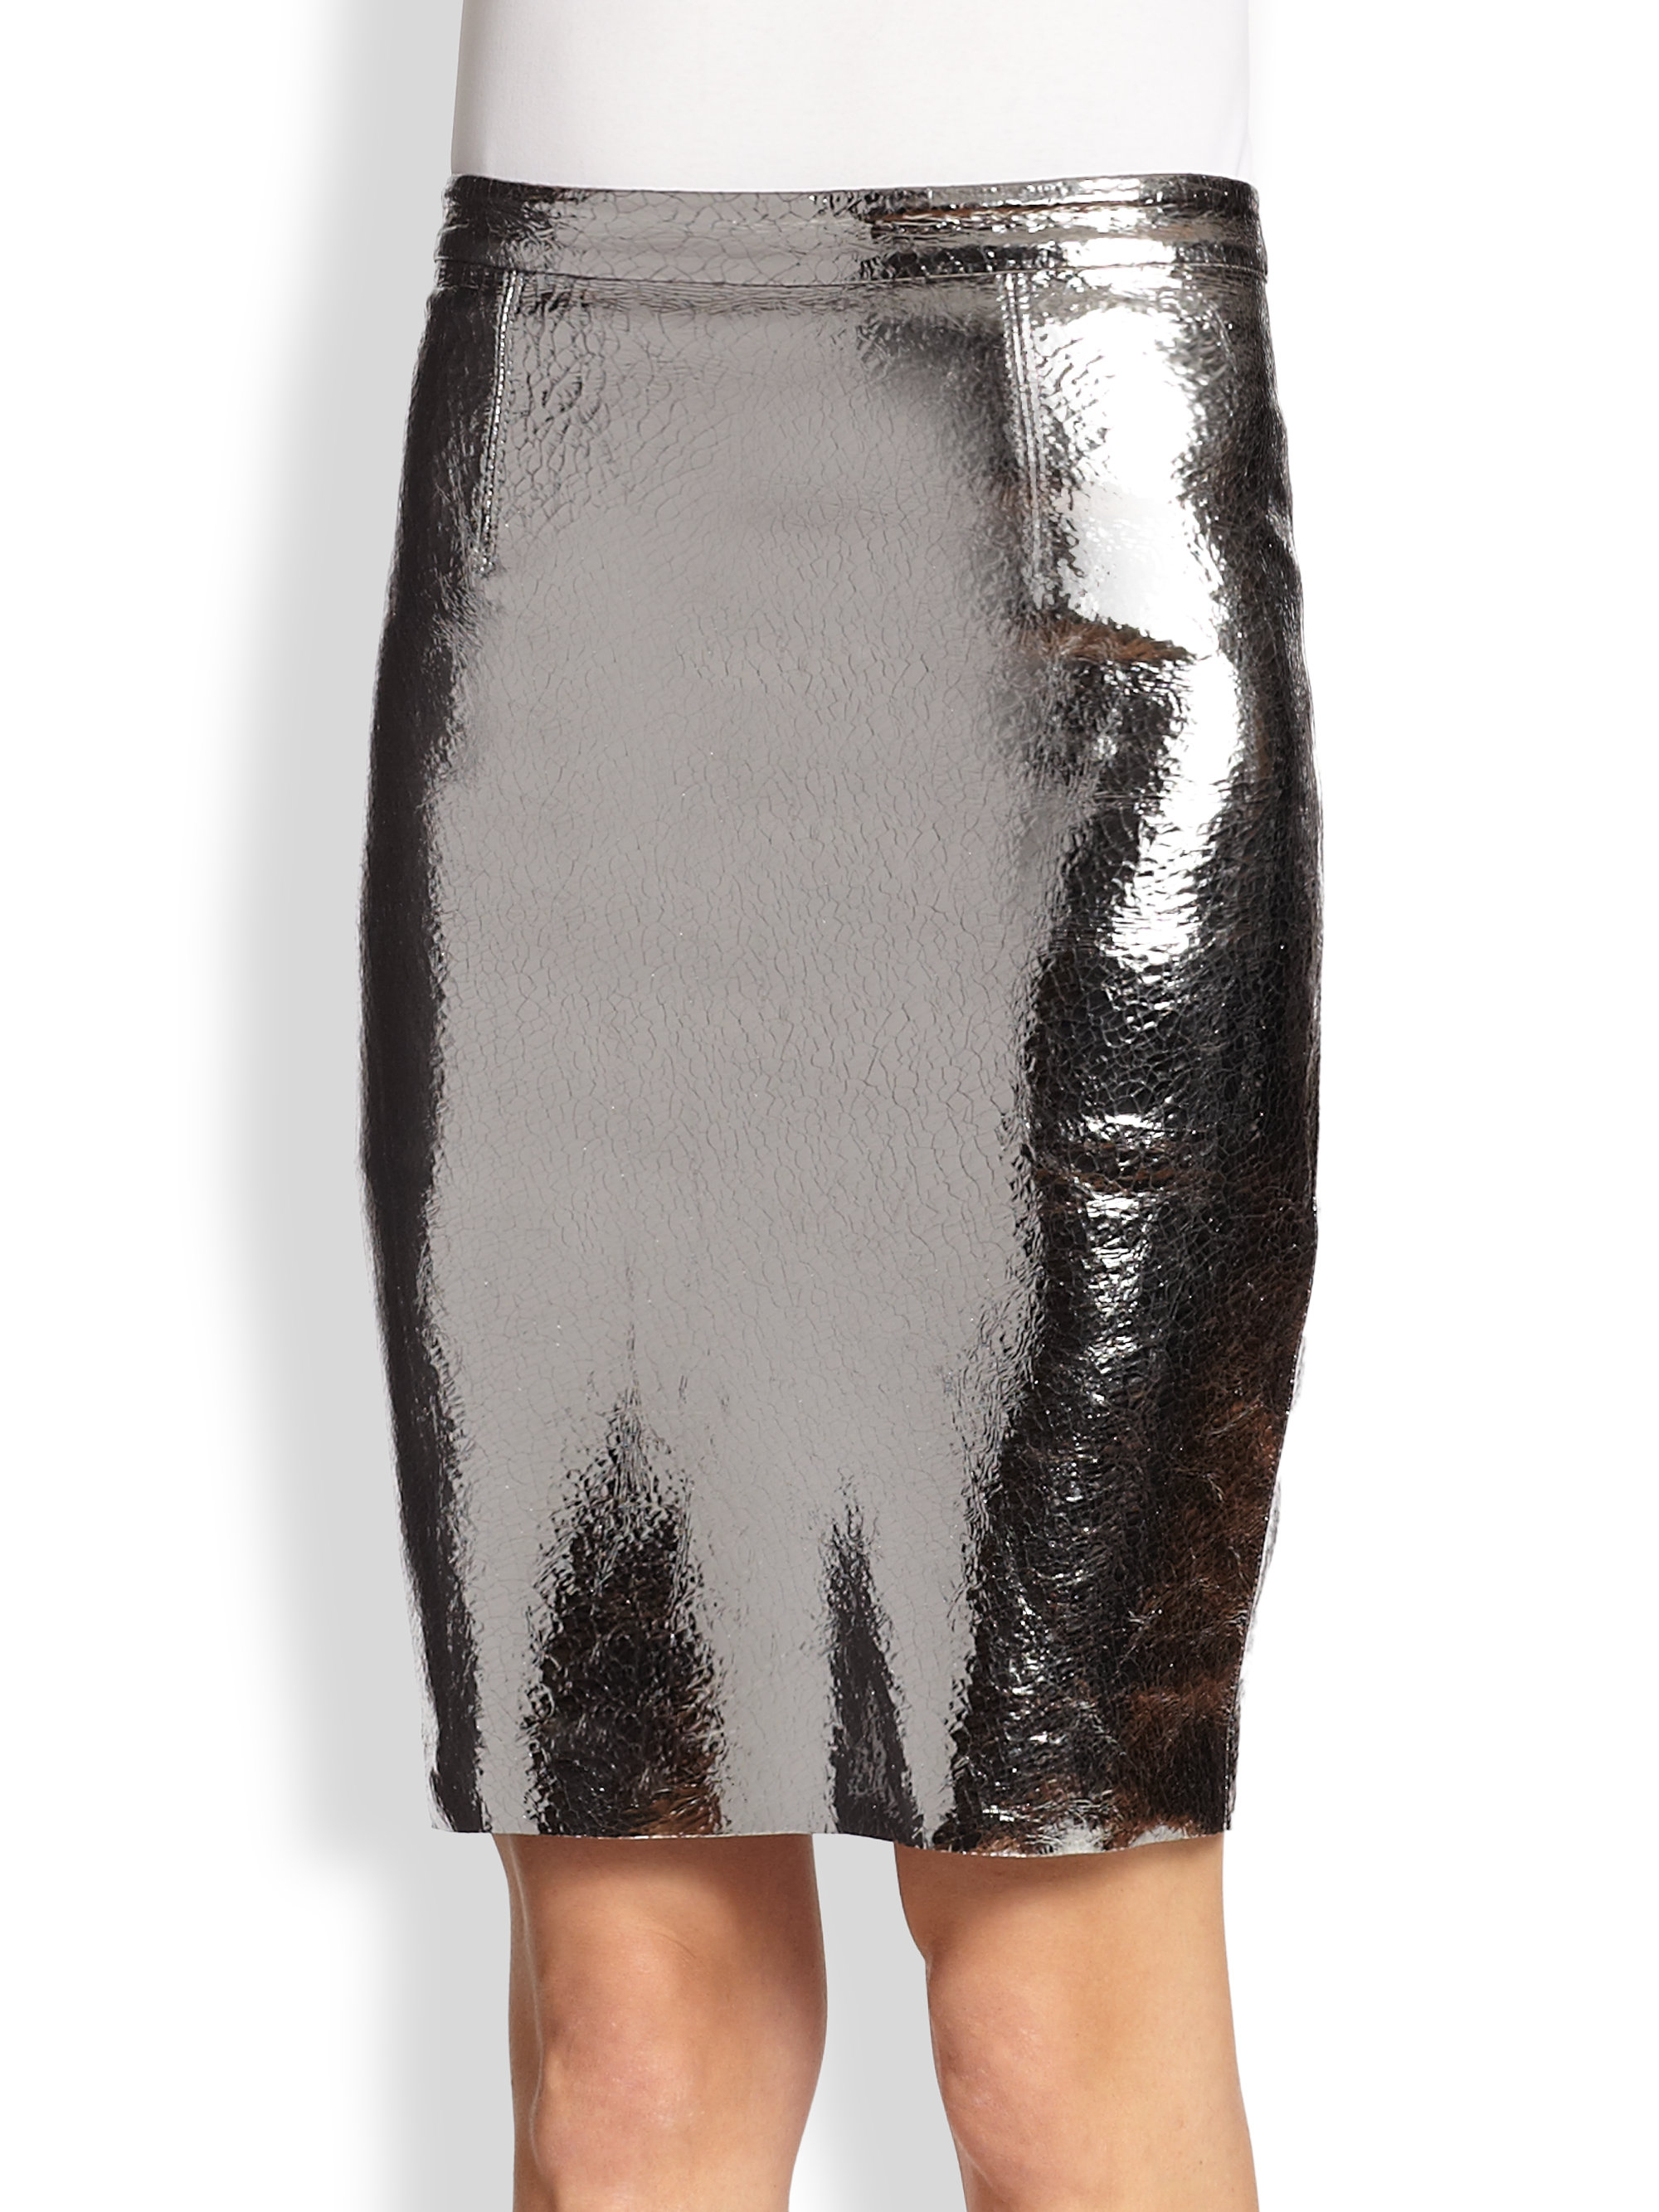 milly metallic leather pencil skirt in silver gunmetal